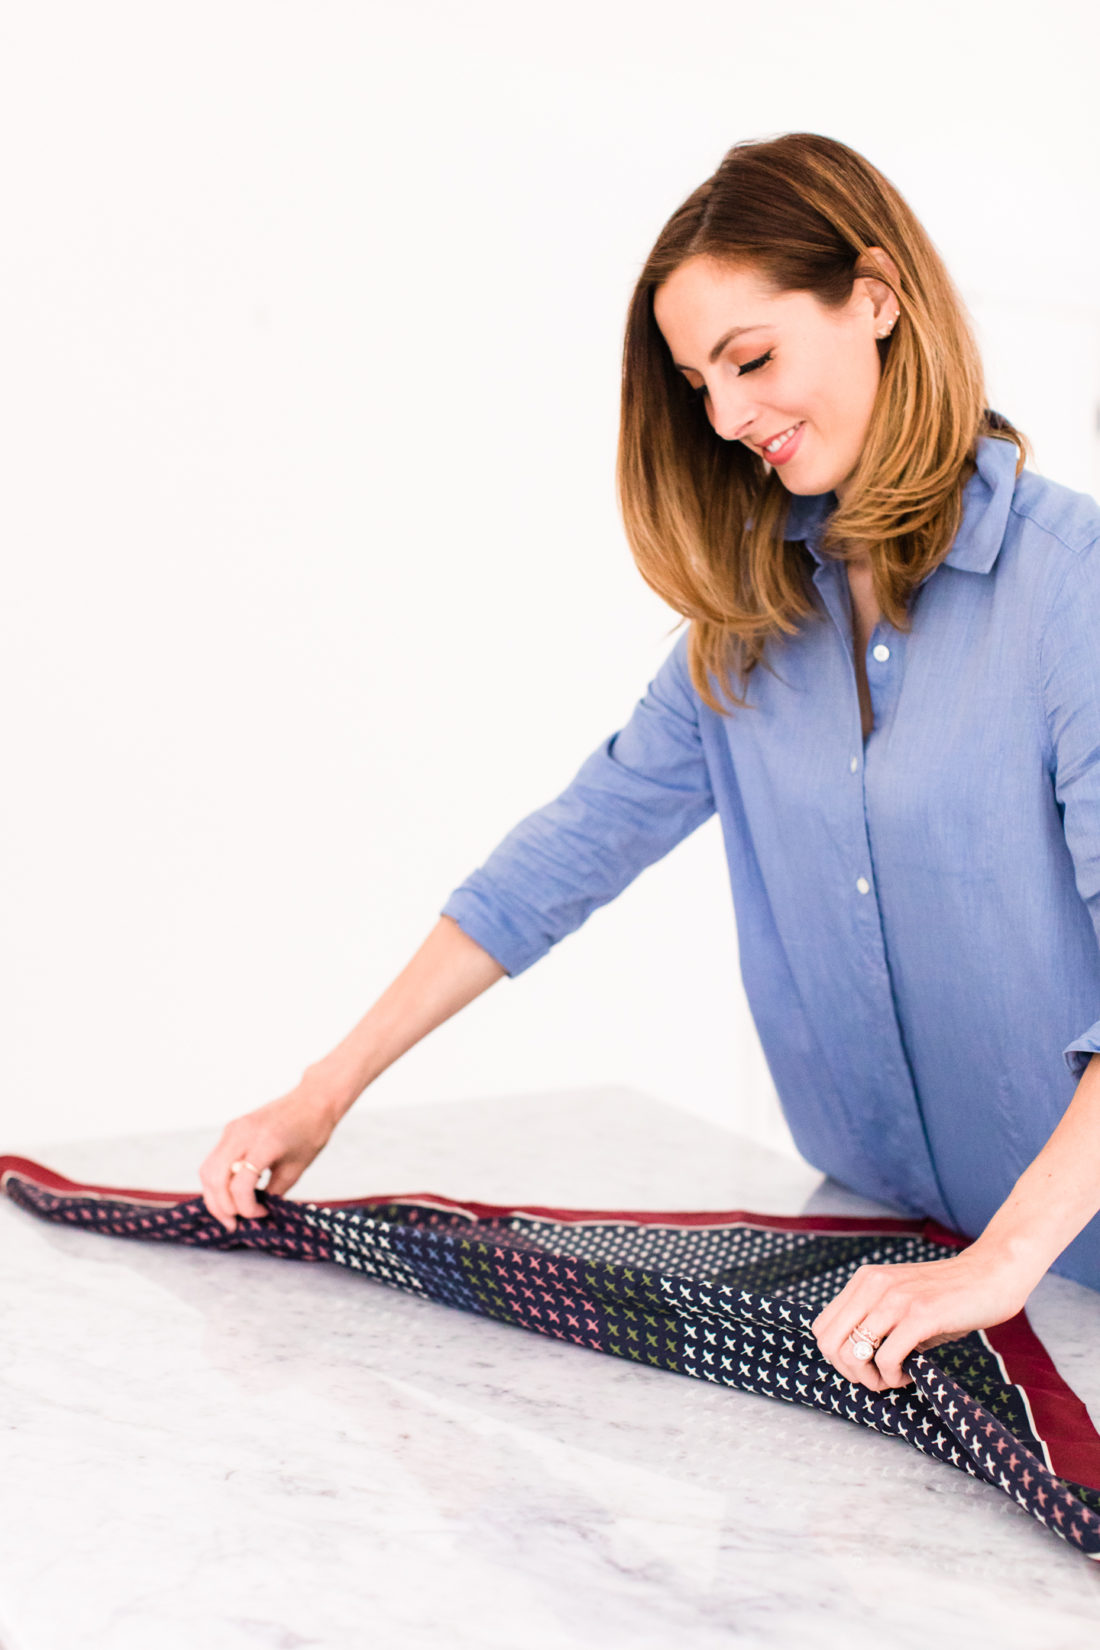 Eva Amurri Martino folds a patterned silk scarf to tie on her purse